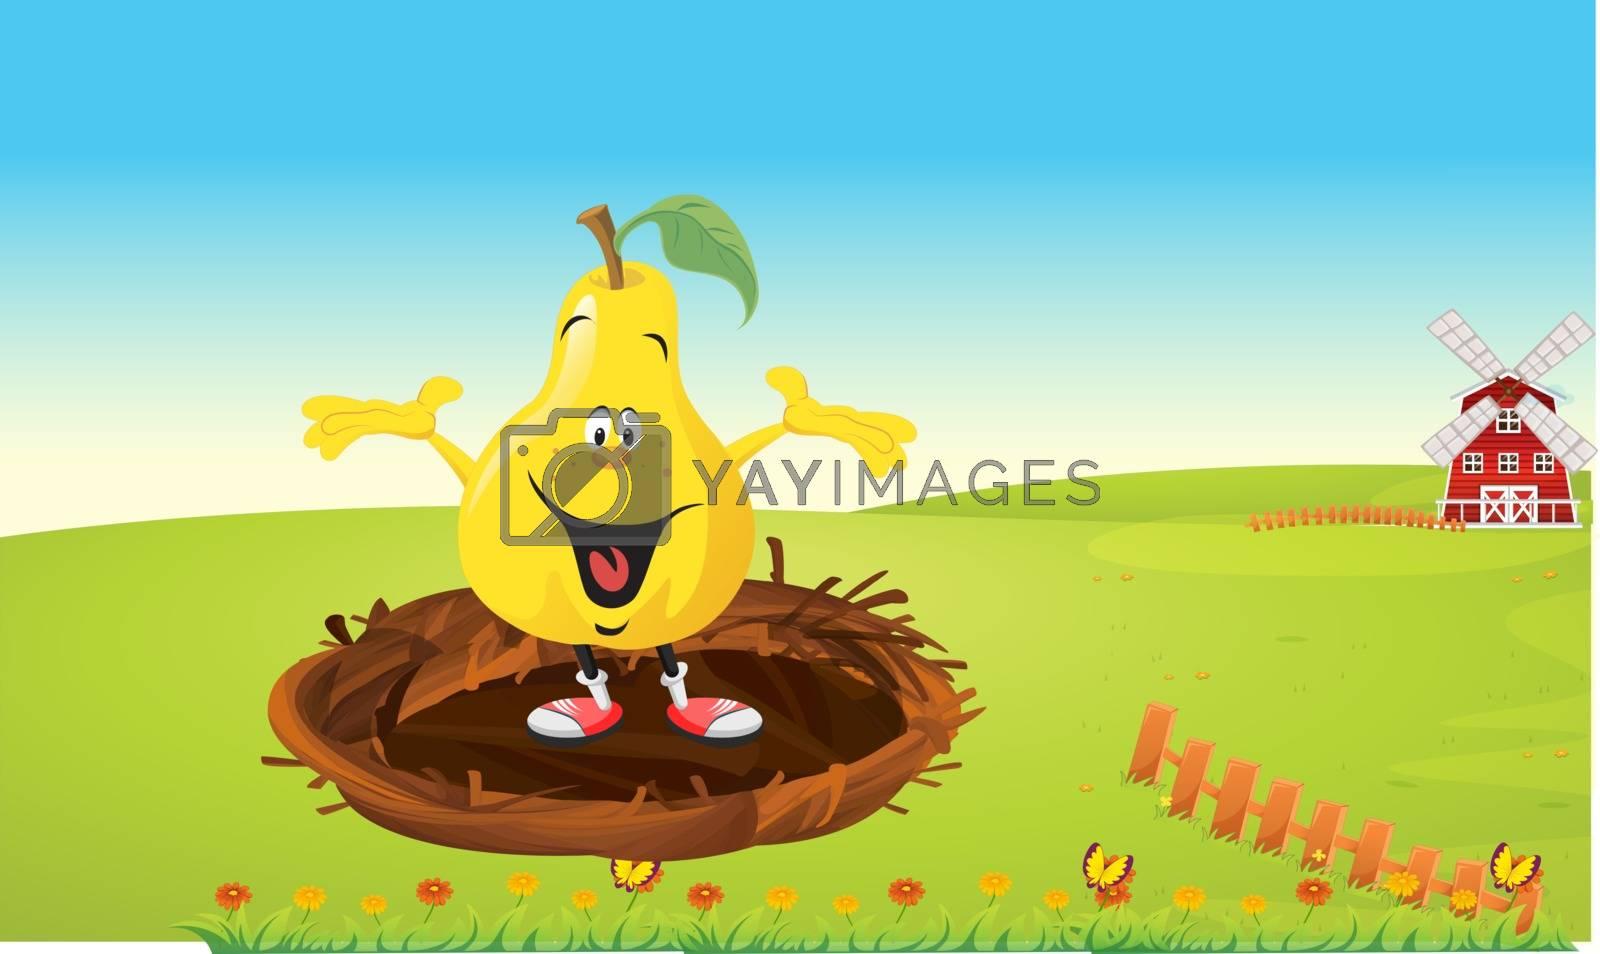 a fruit is dancing in a bird nest in the garden